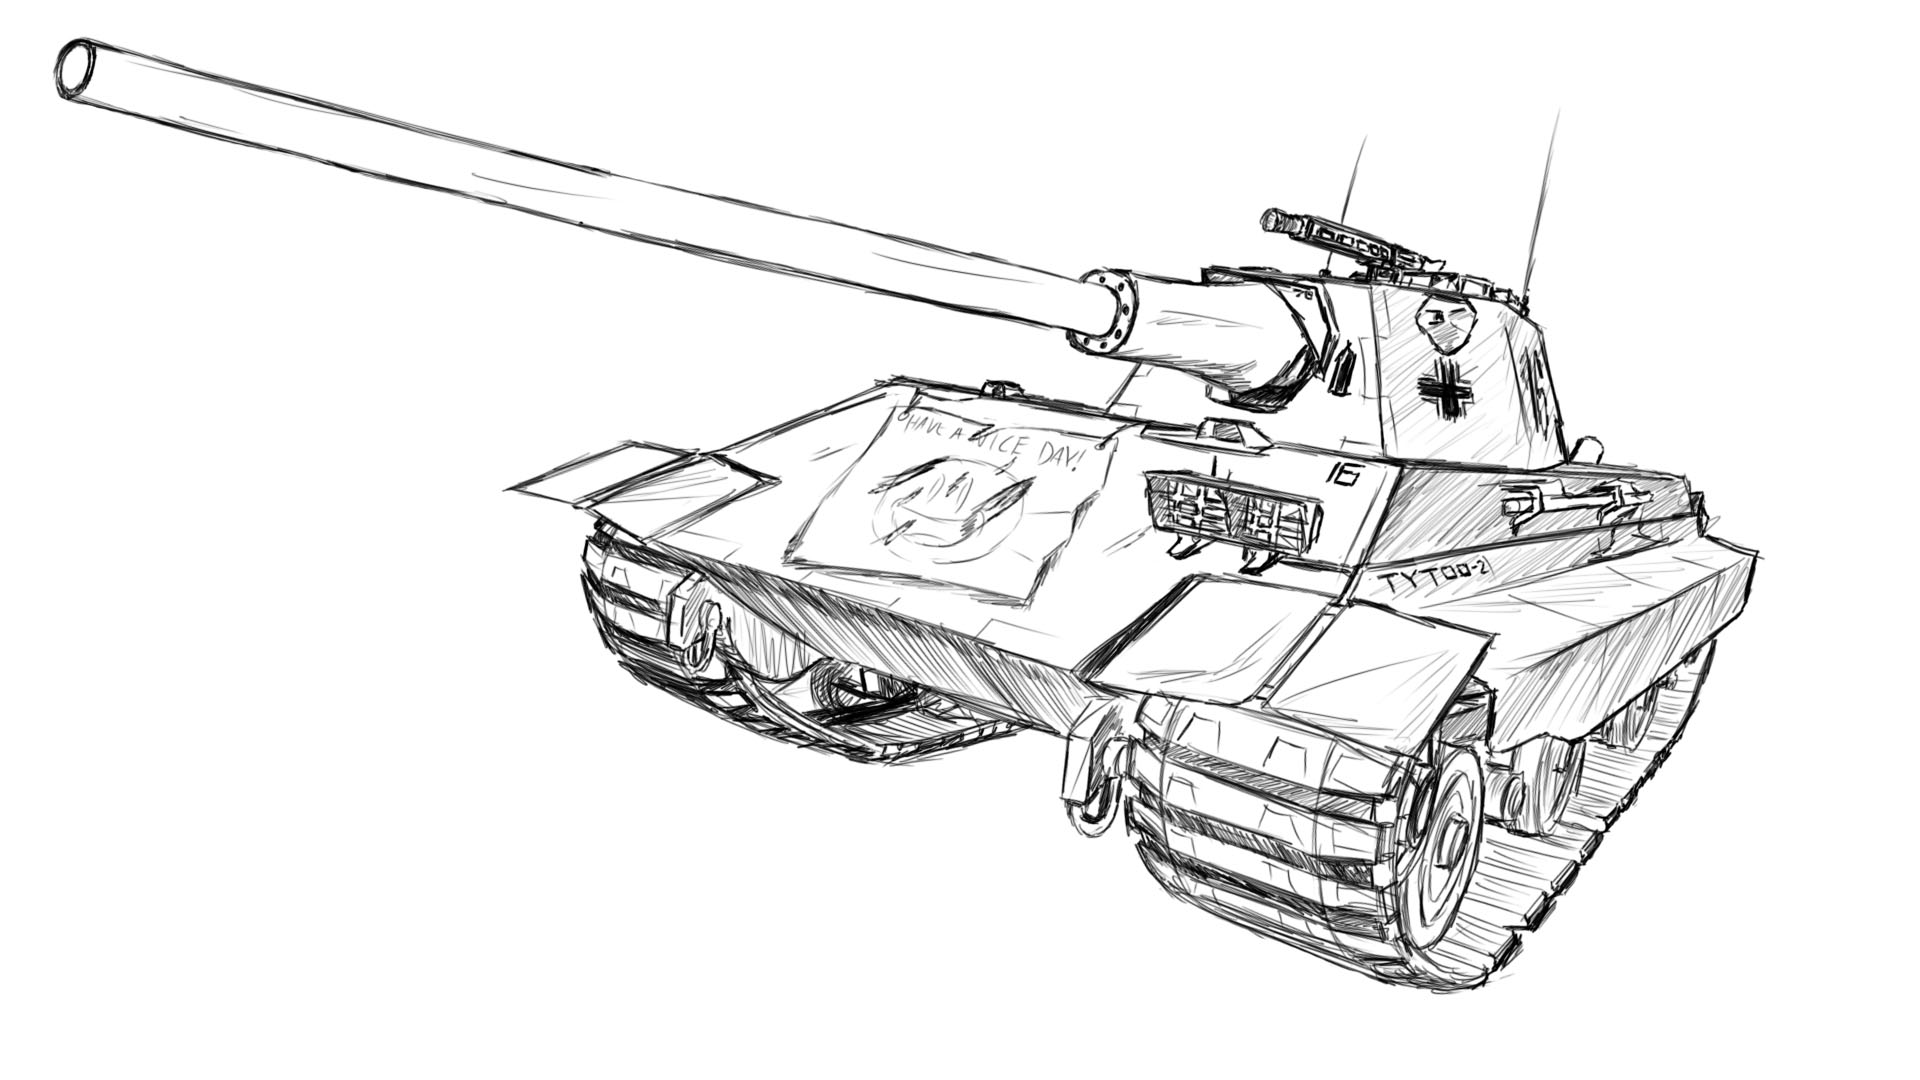 Churchill Tank Drawing At Getdrawings